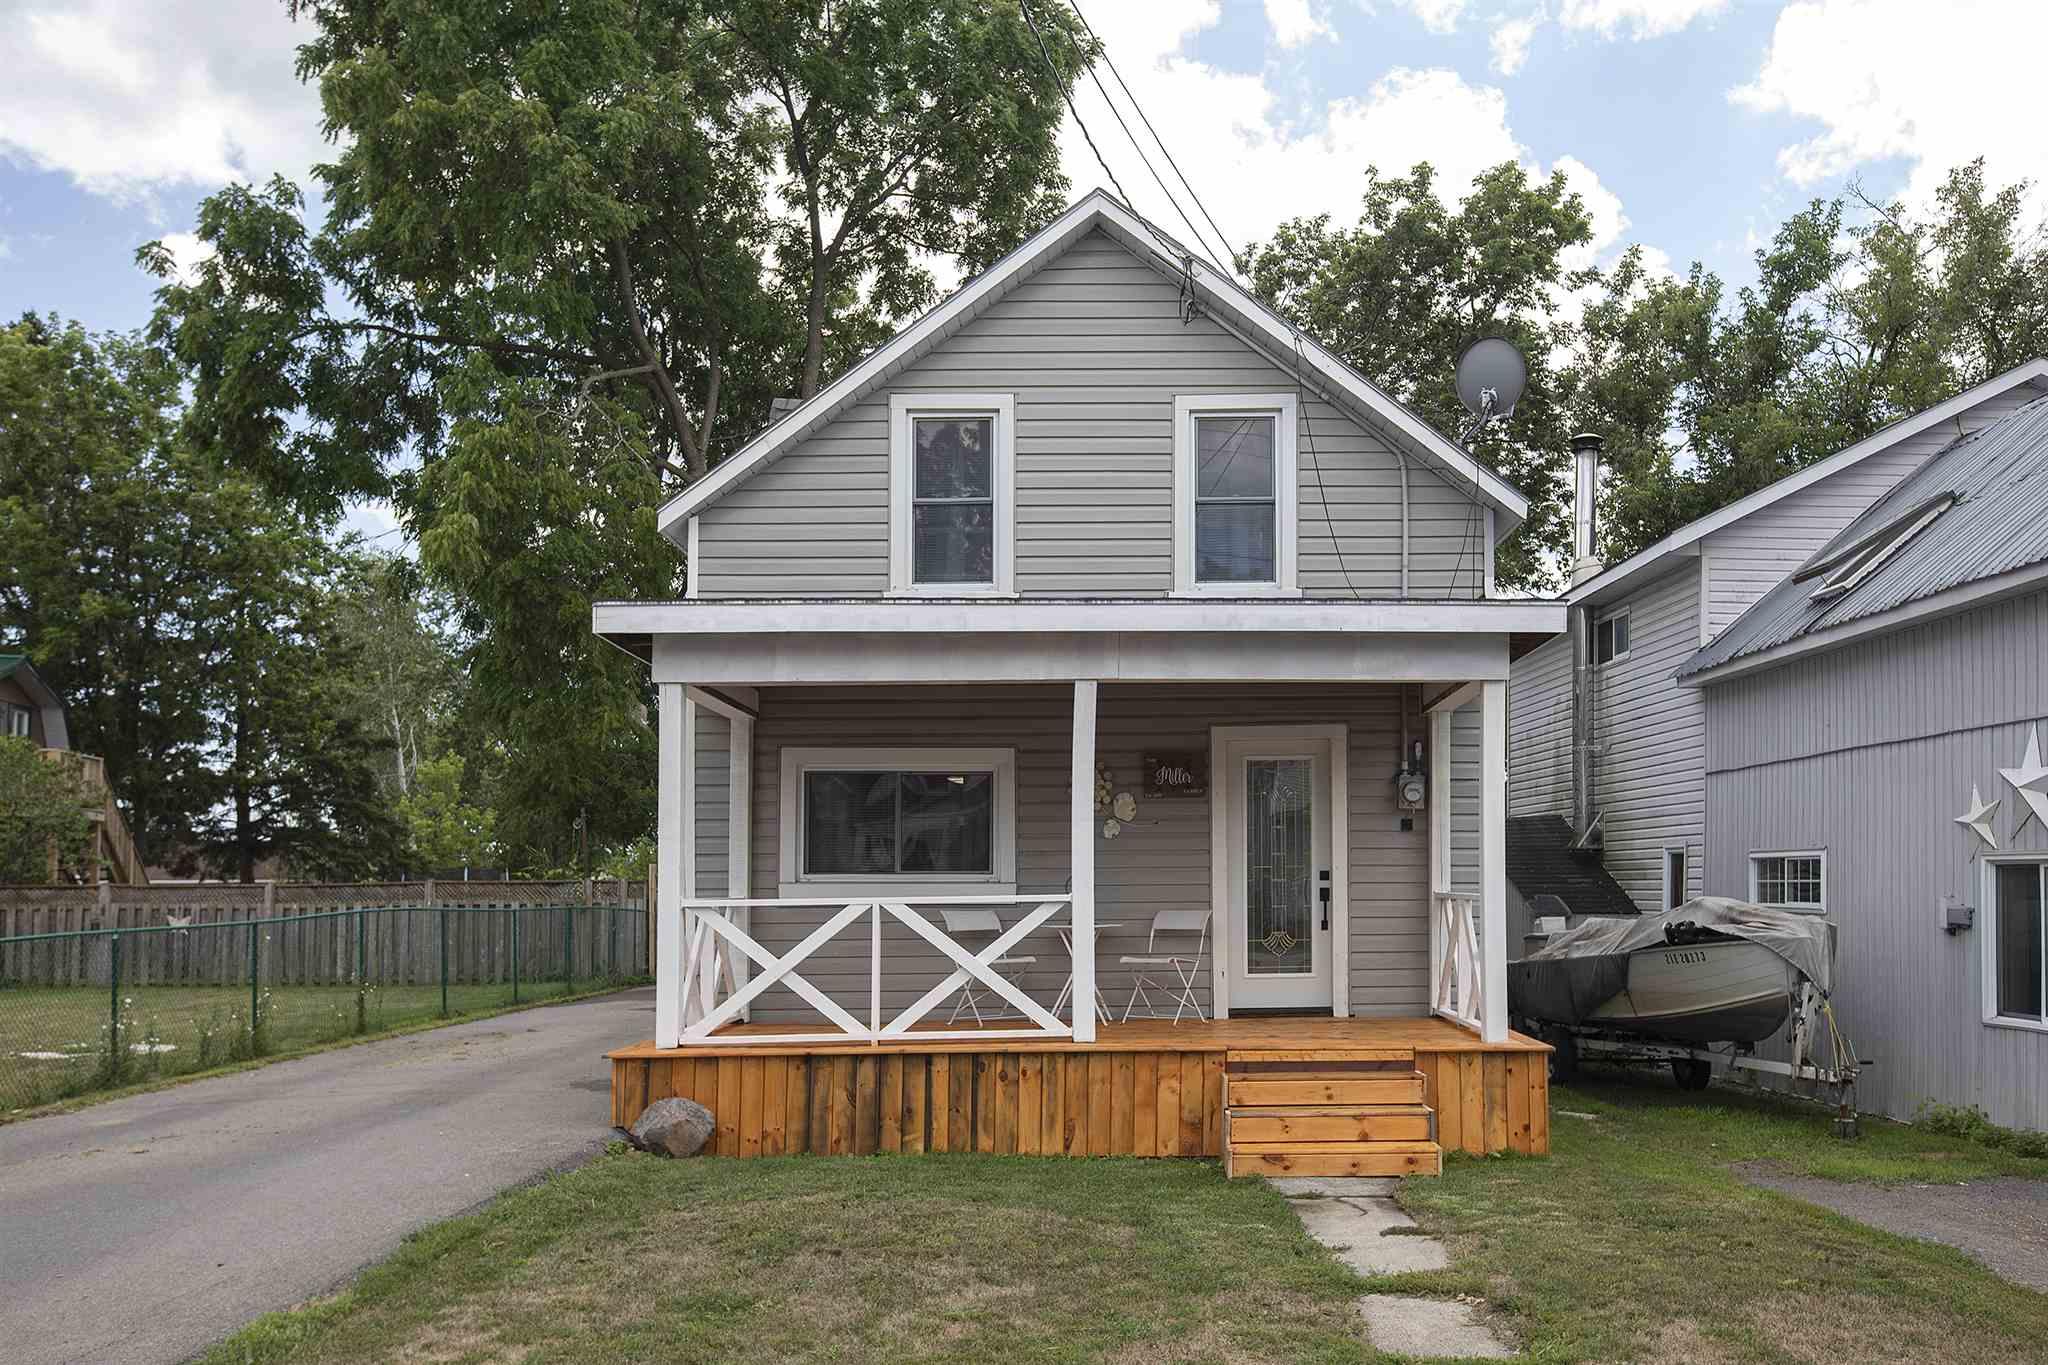 392 Thomas Street, Deseronto, Ontario, Canada